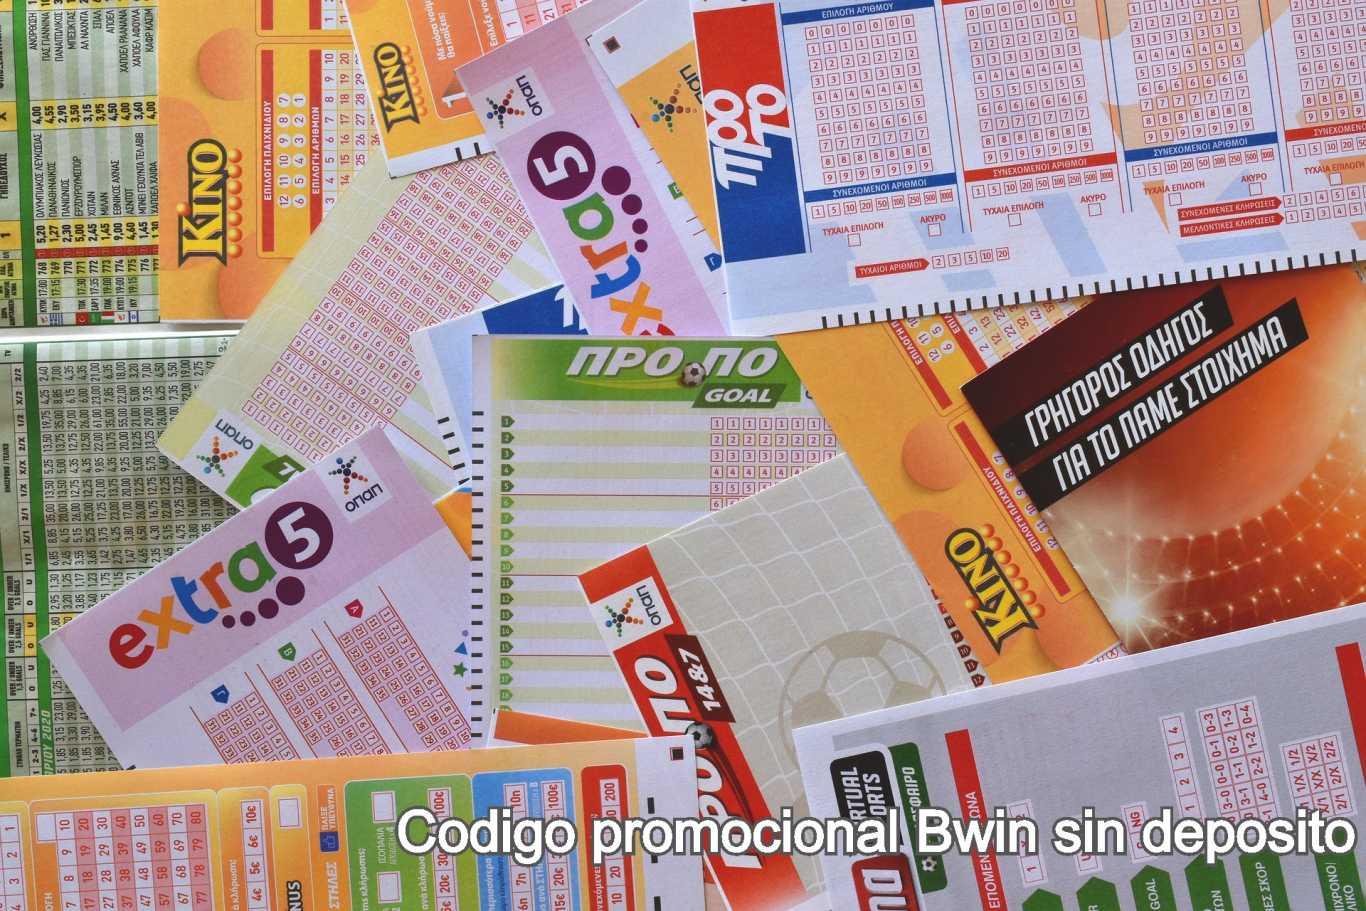 Codigo promocional Bwin sin deposito